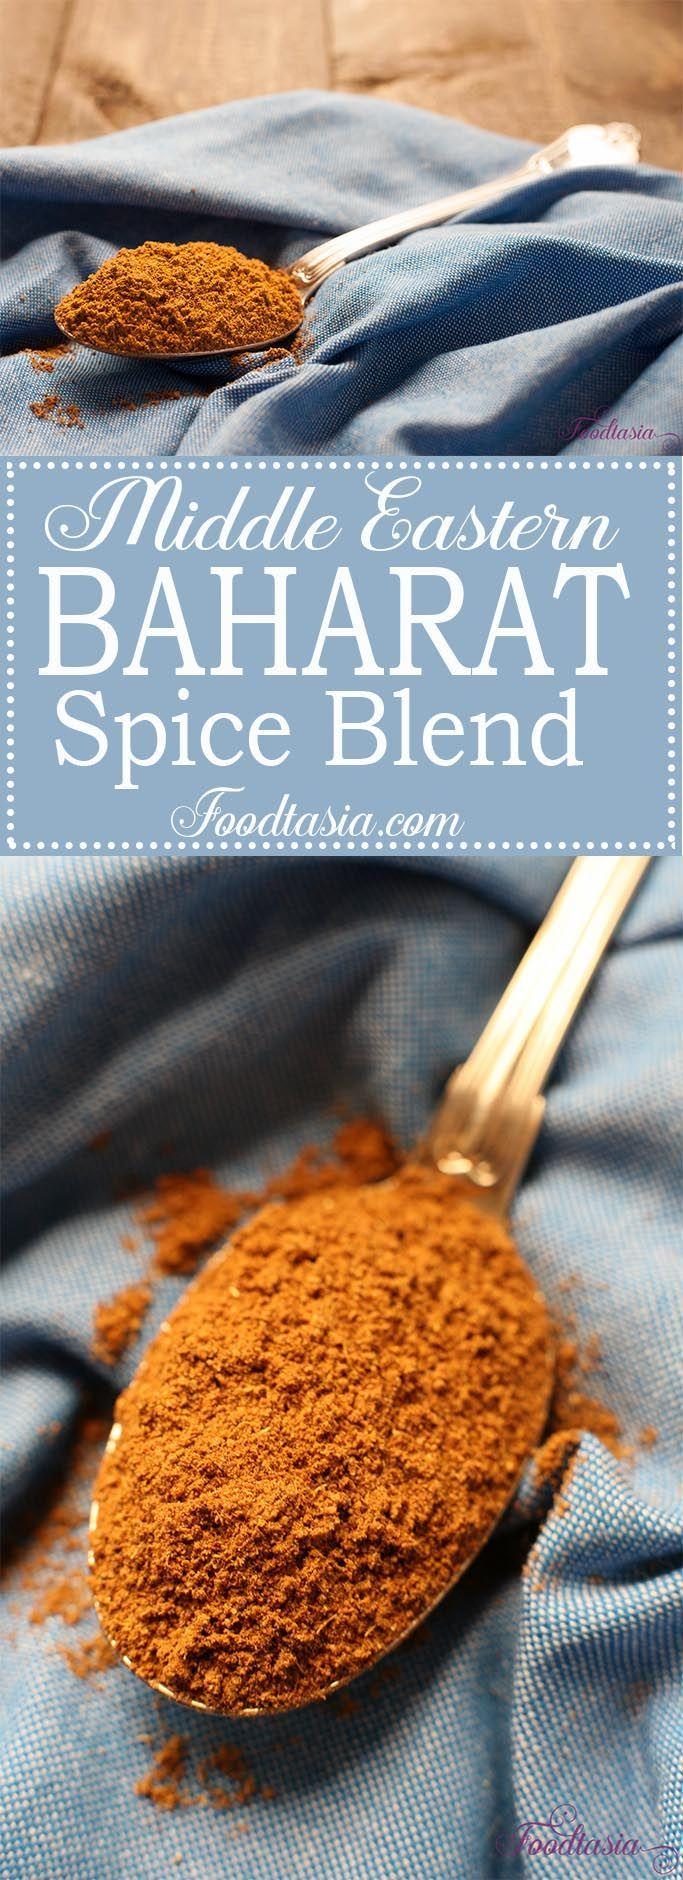 Blue apron quesadilla spice blend - Baharat Middle Eastern Spice Blend